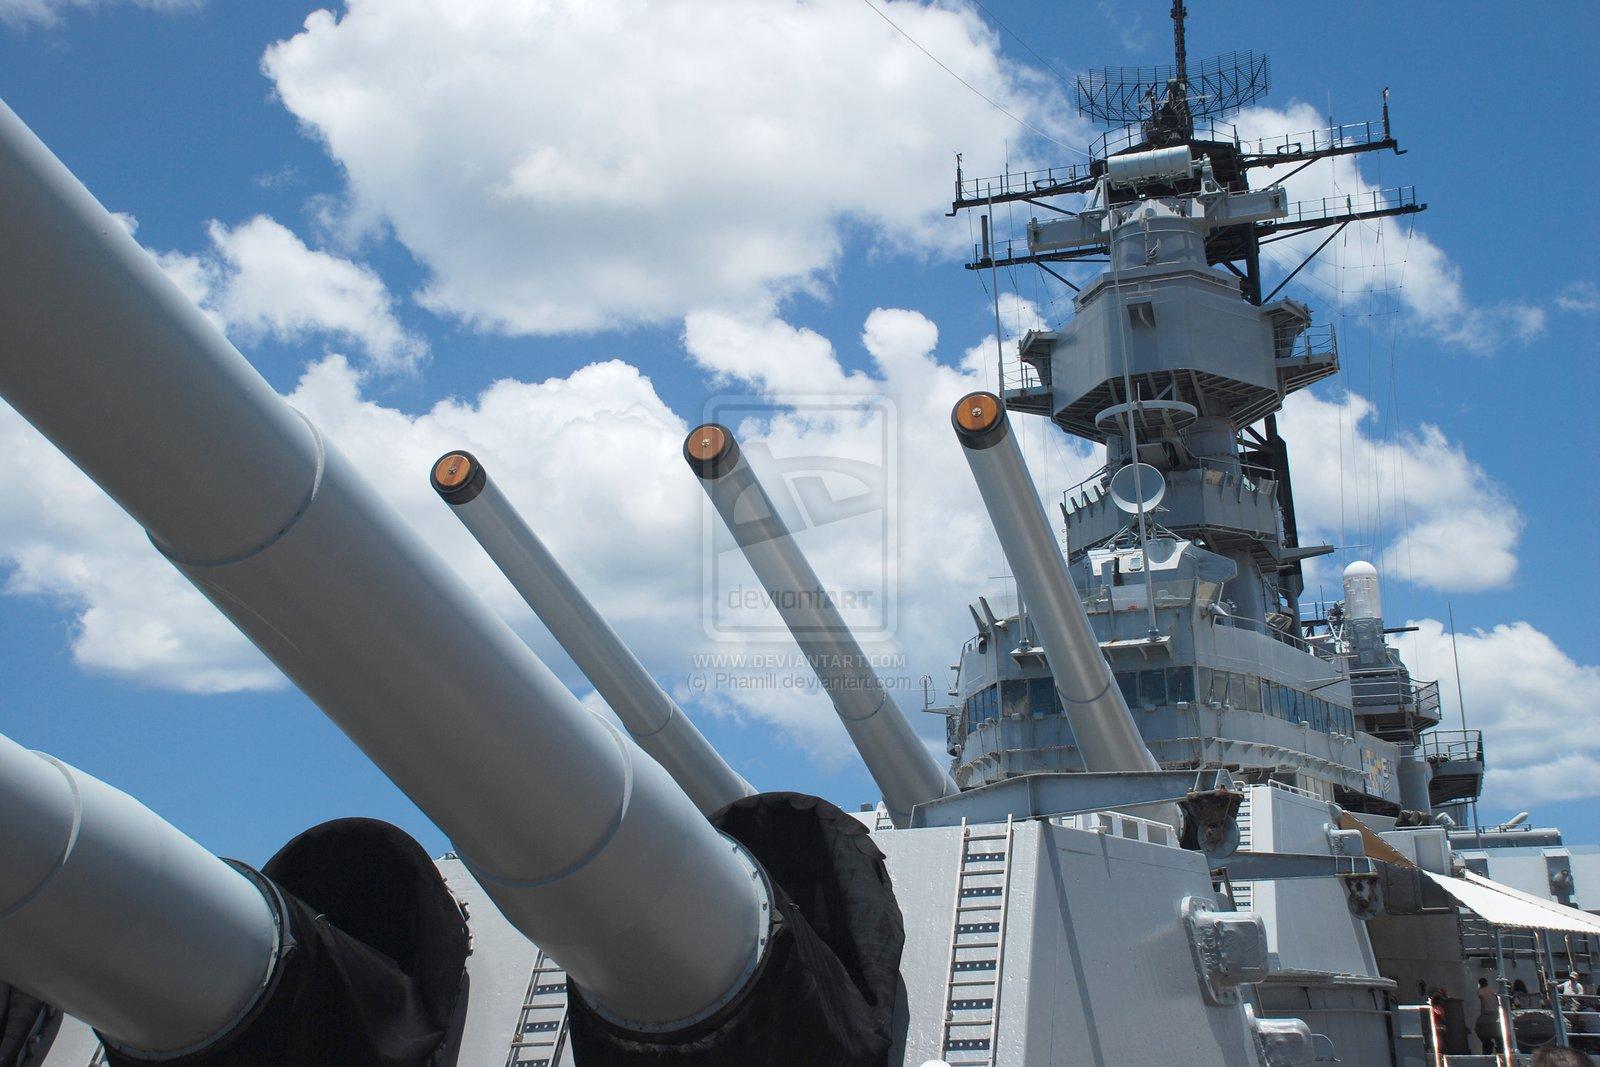 Pin Wallpapers Missouri Uss Battleship Hawaii Memorial Museum Navy on 1600x1067